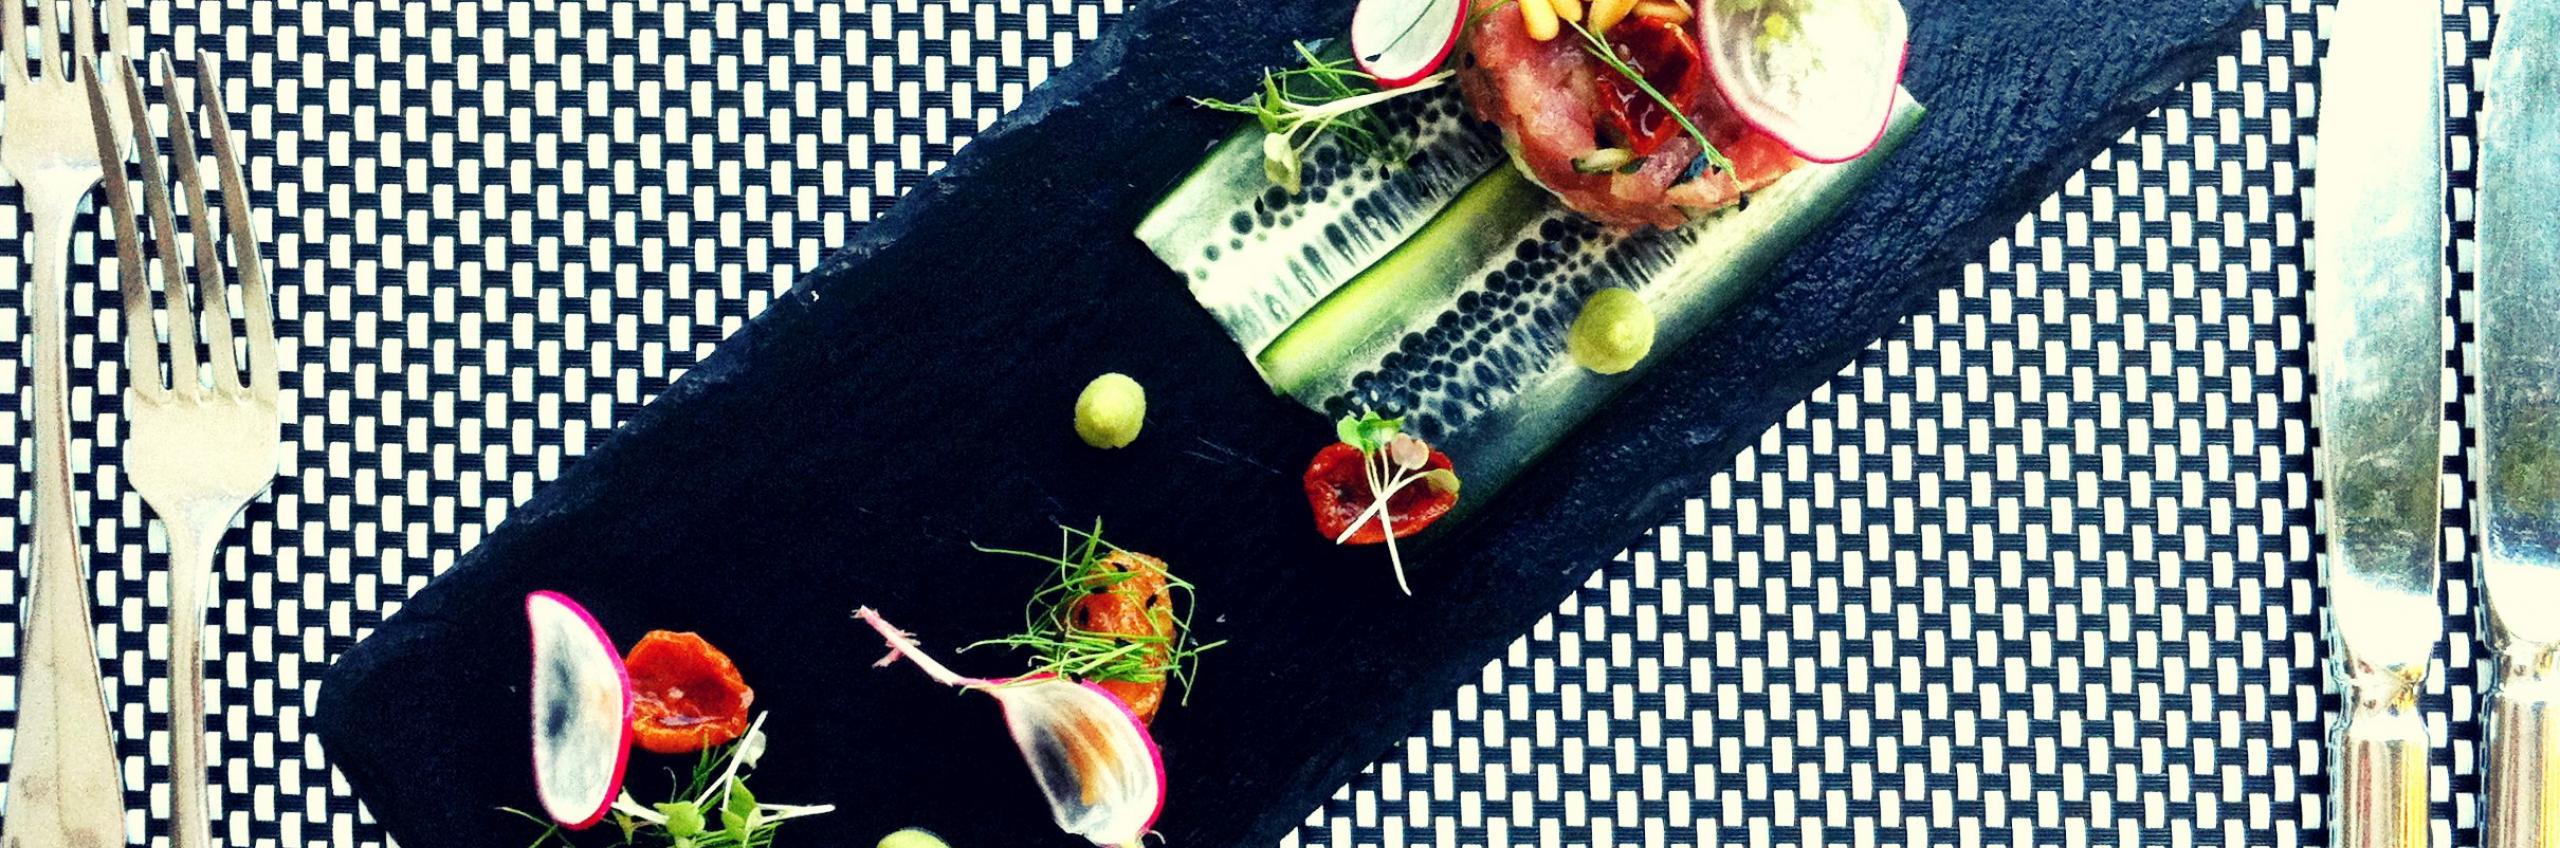 Creative dining at the best waterfront restaurant Butchery & Wine Hvar